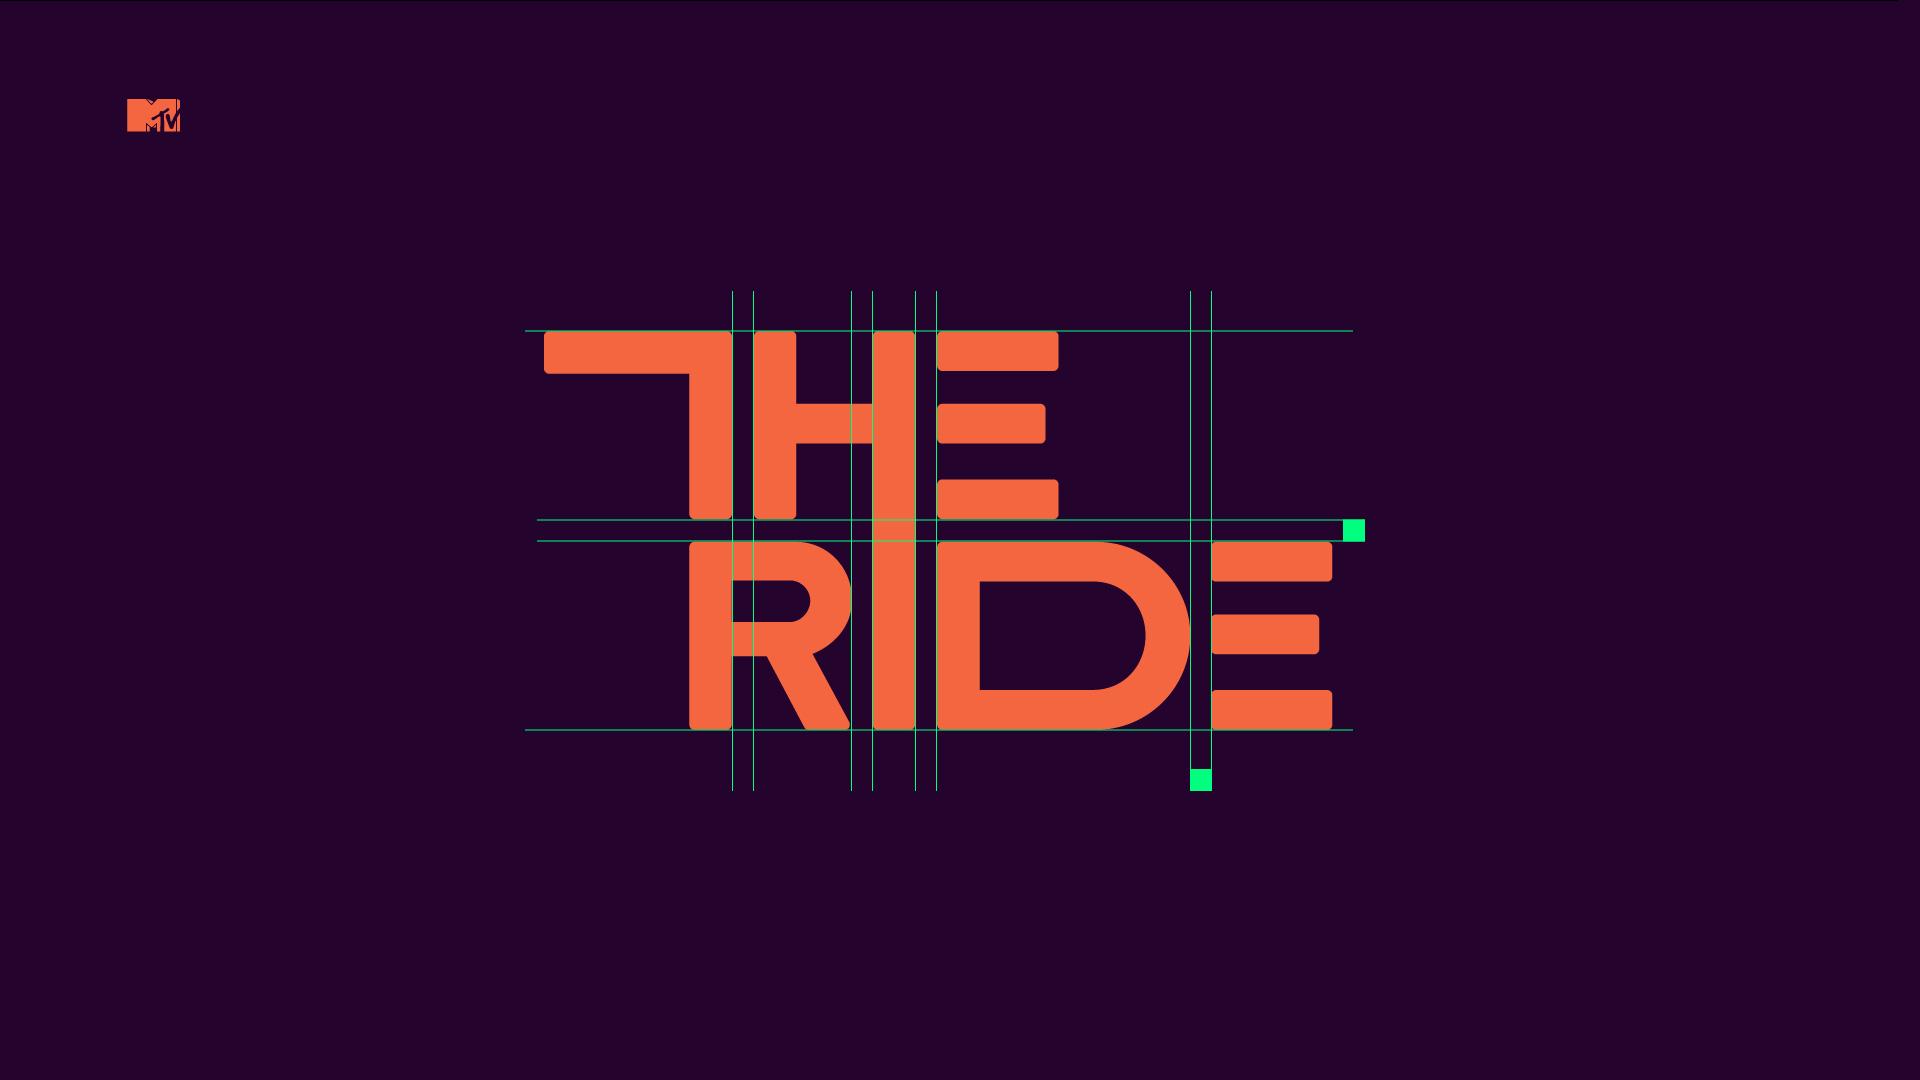 MTV_THE_RIDE_3